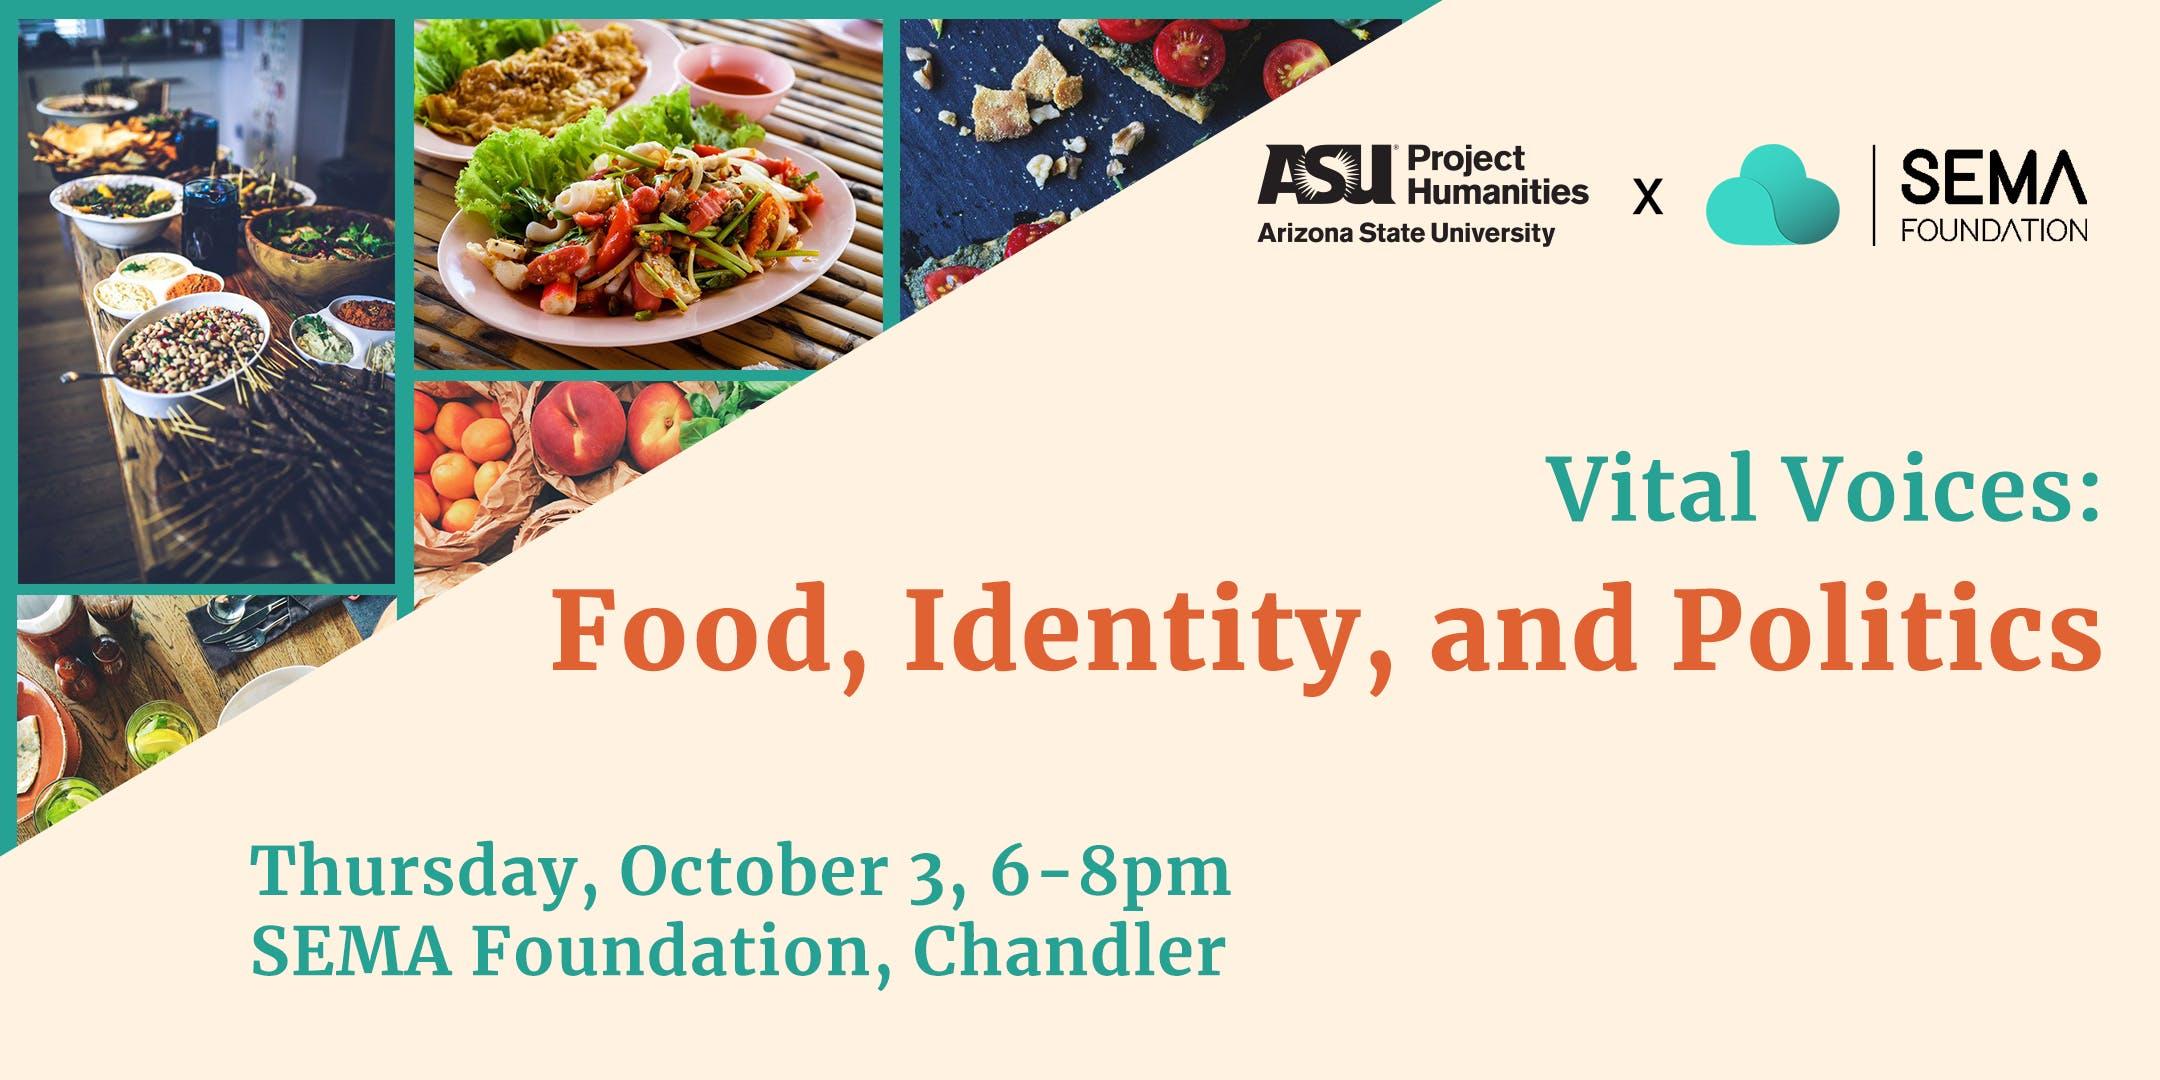 Vital Voices: Food, Identity and Politics